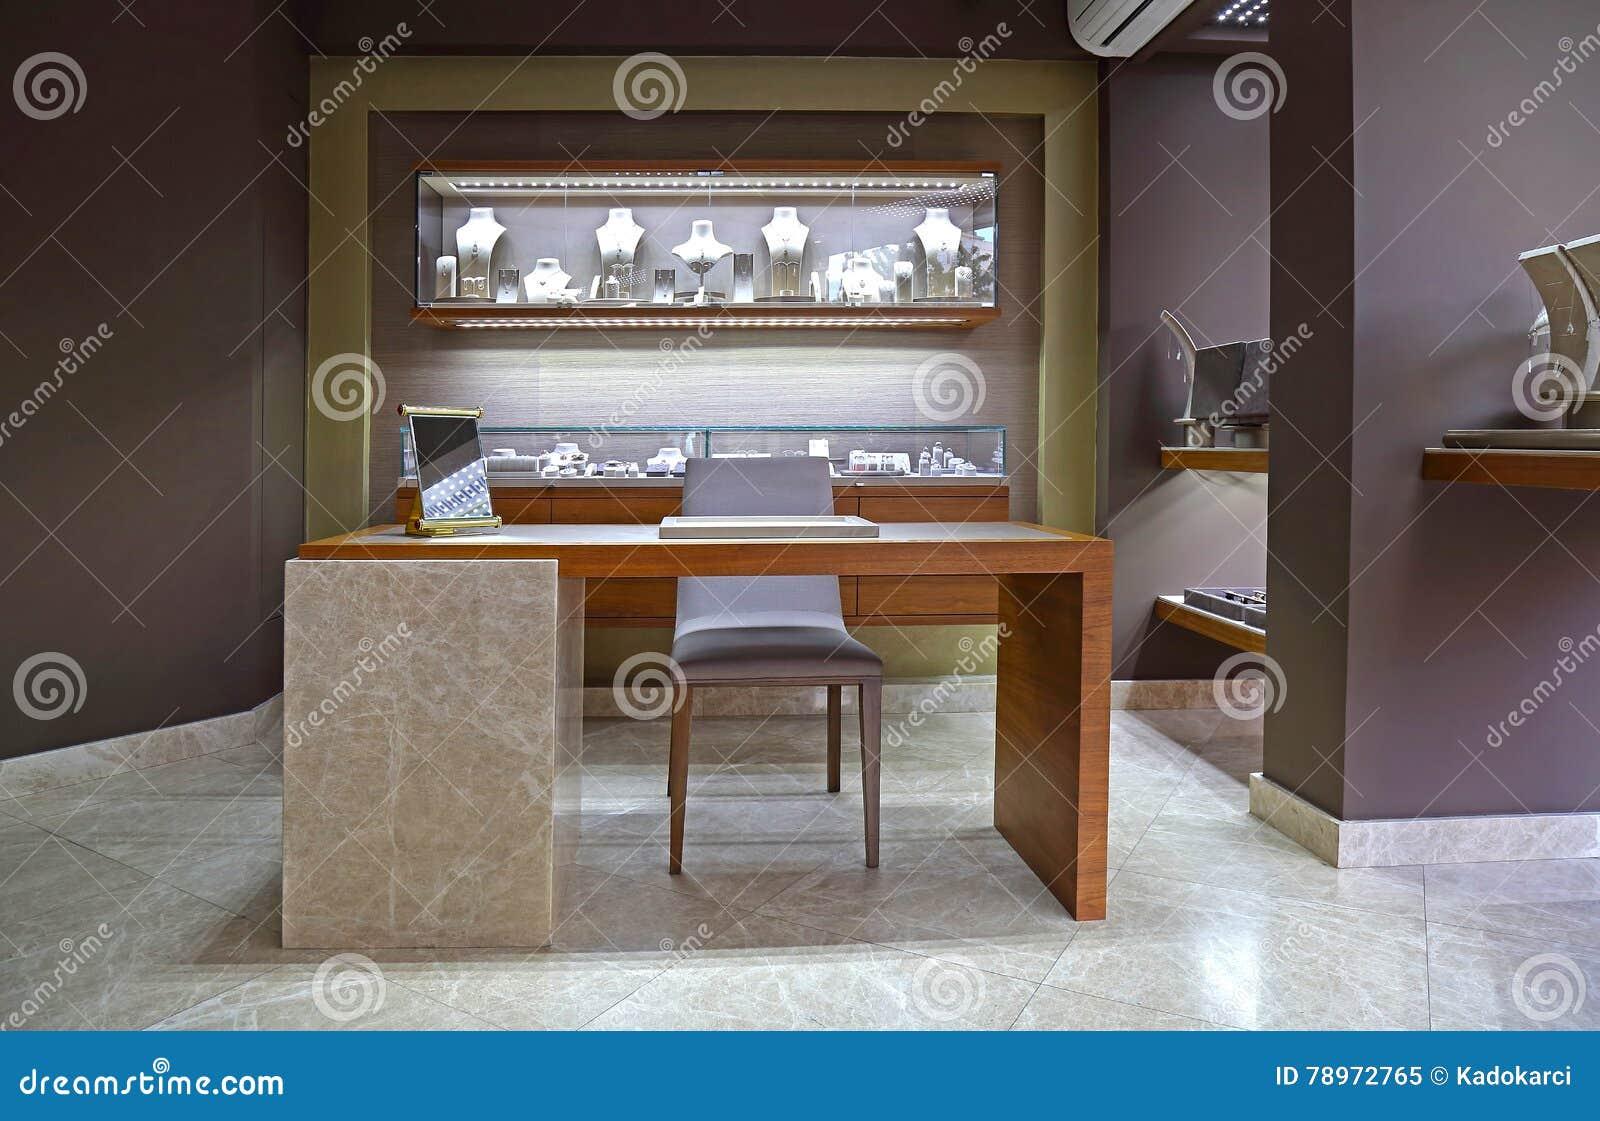 Jewelerymän lagrar wempekvinnor